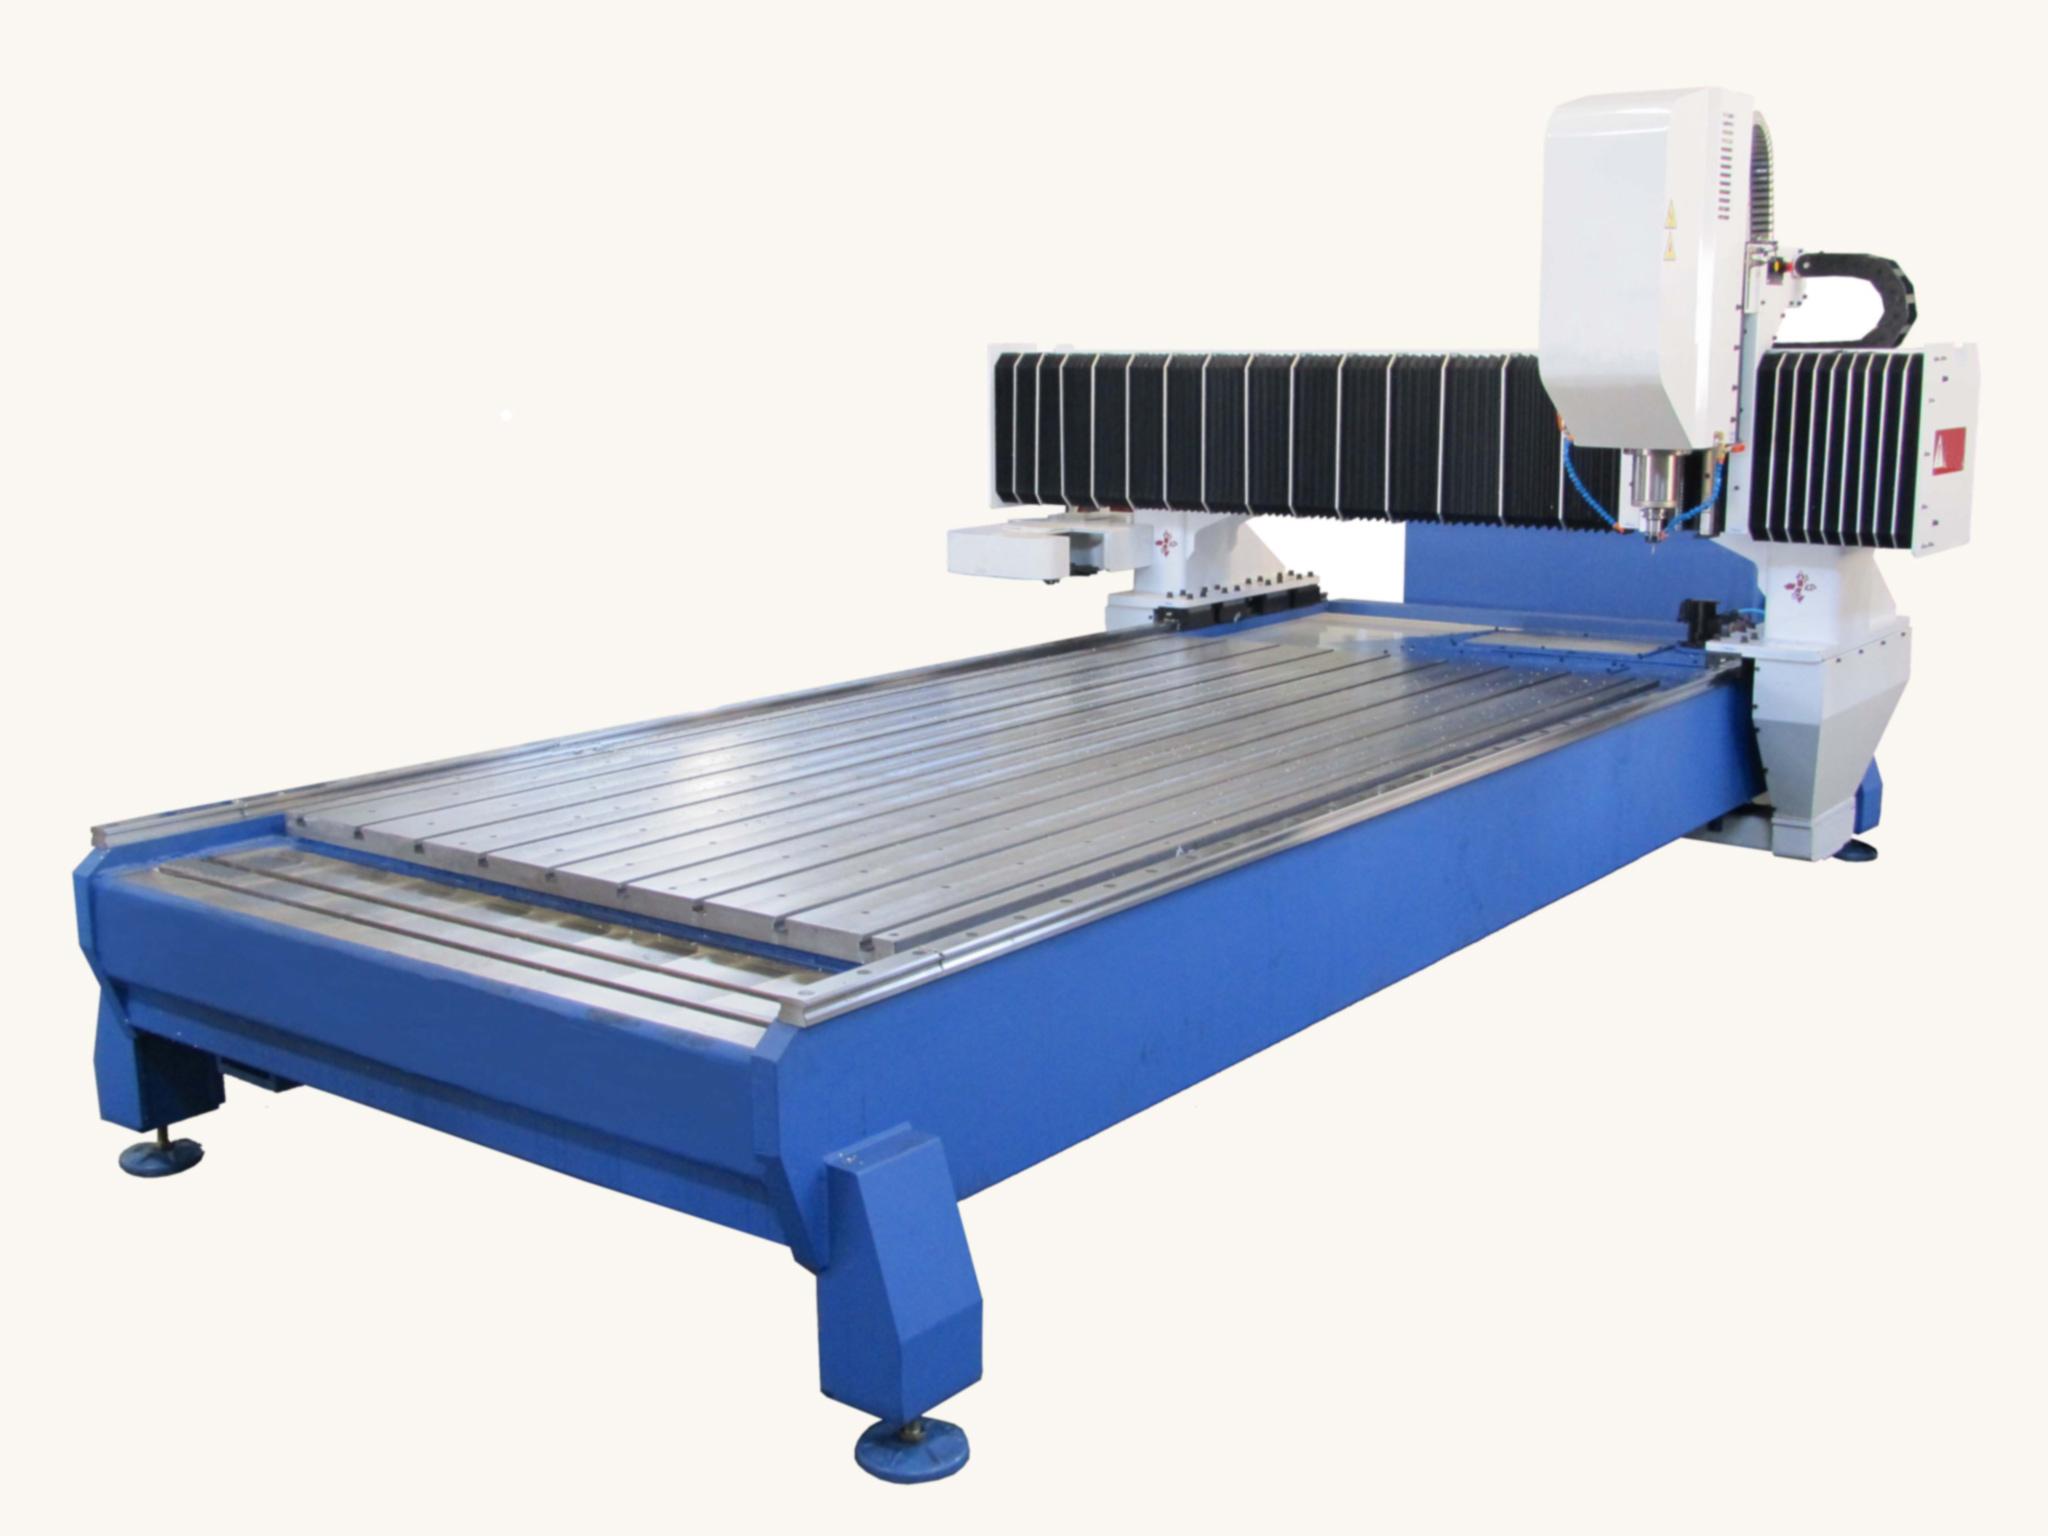 CNC Maschine SkyCNC WS 3015 Fräsmaschine